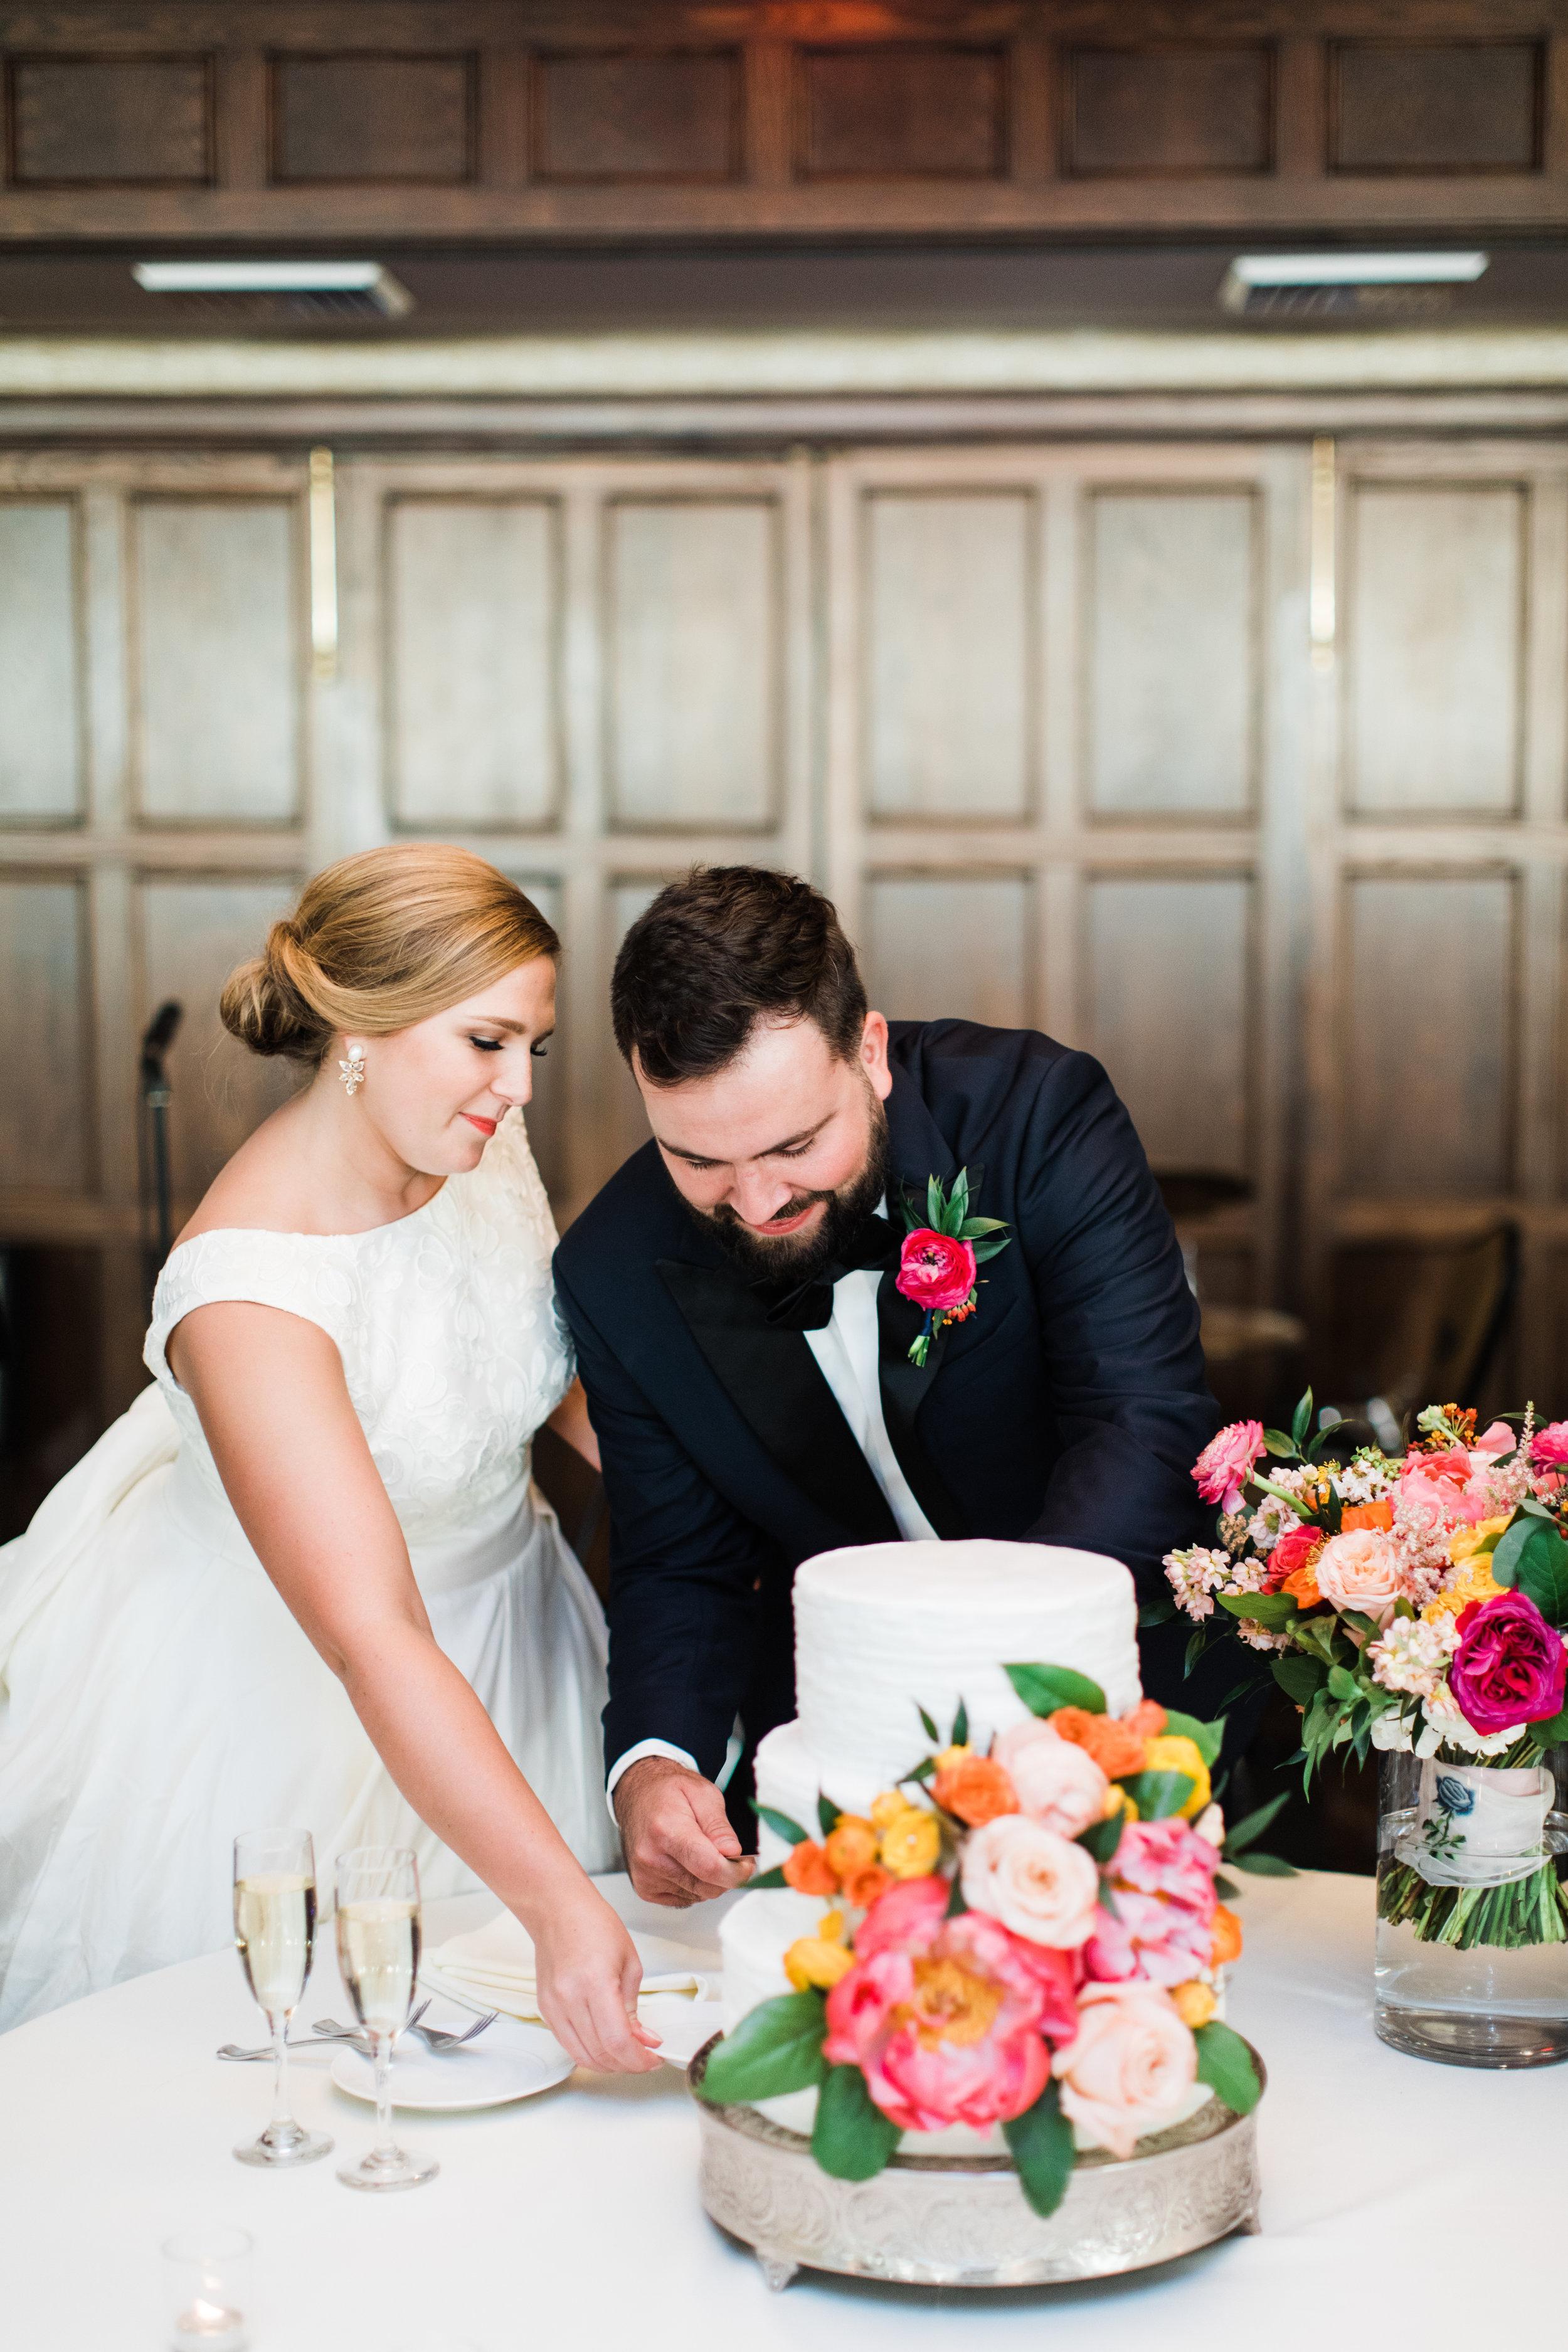 KLIMES WEDDING - MARISSA CRIBBS PHOTOGRAPHY-1057.jpg